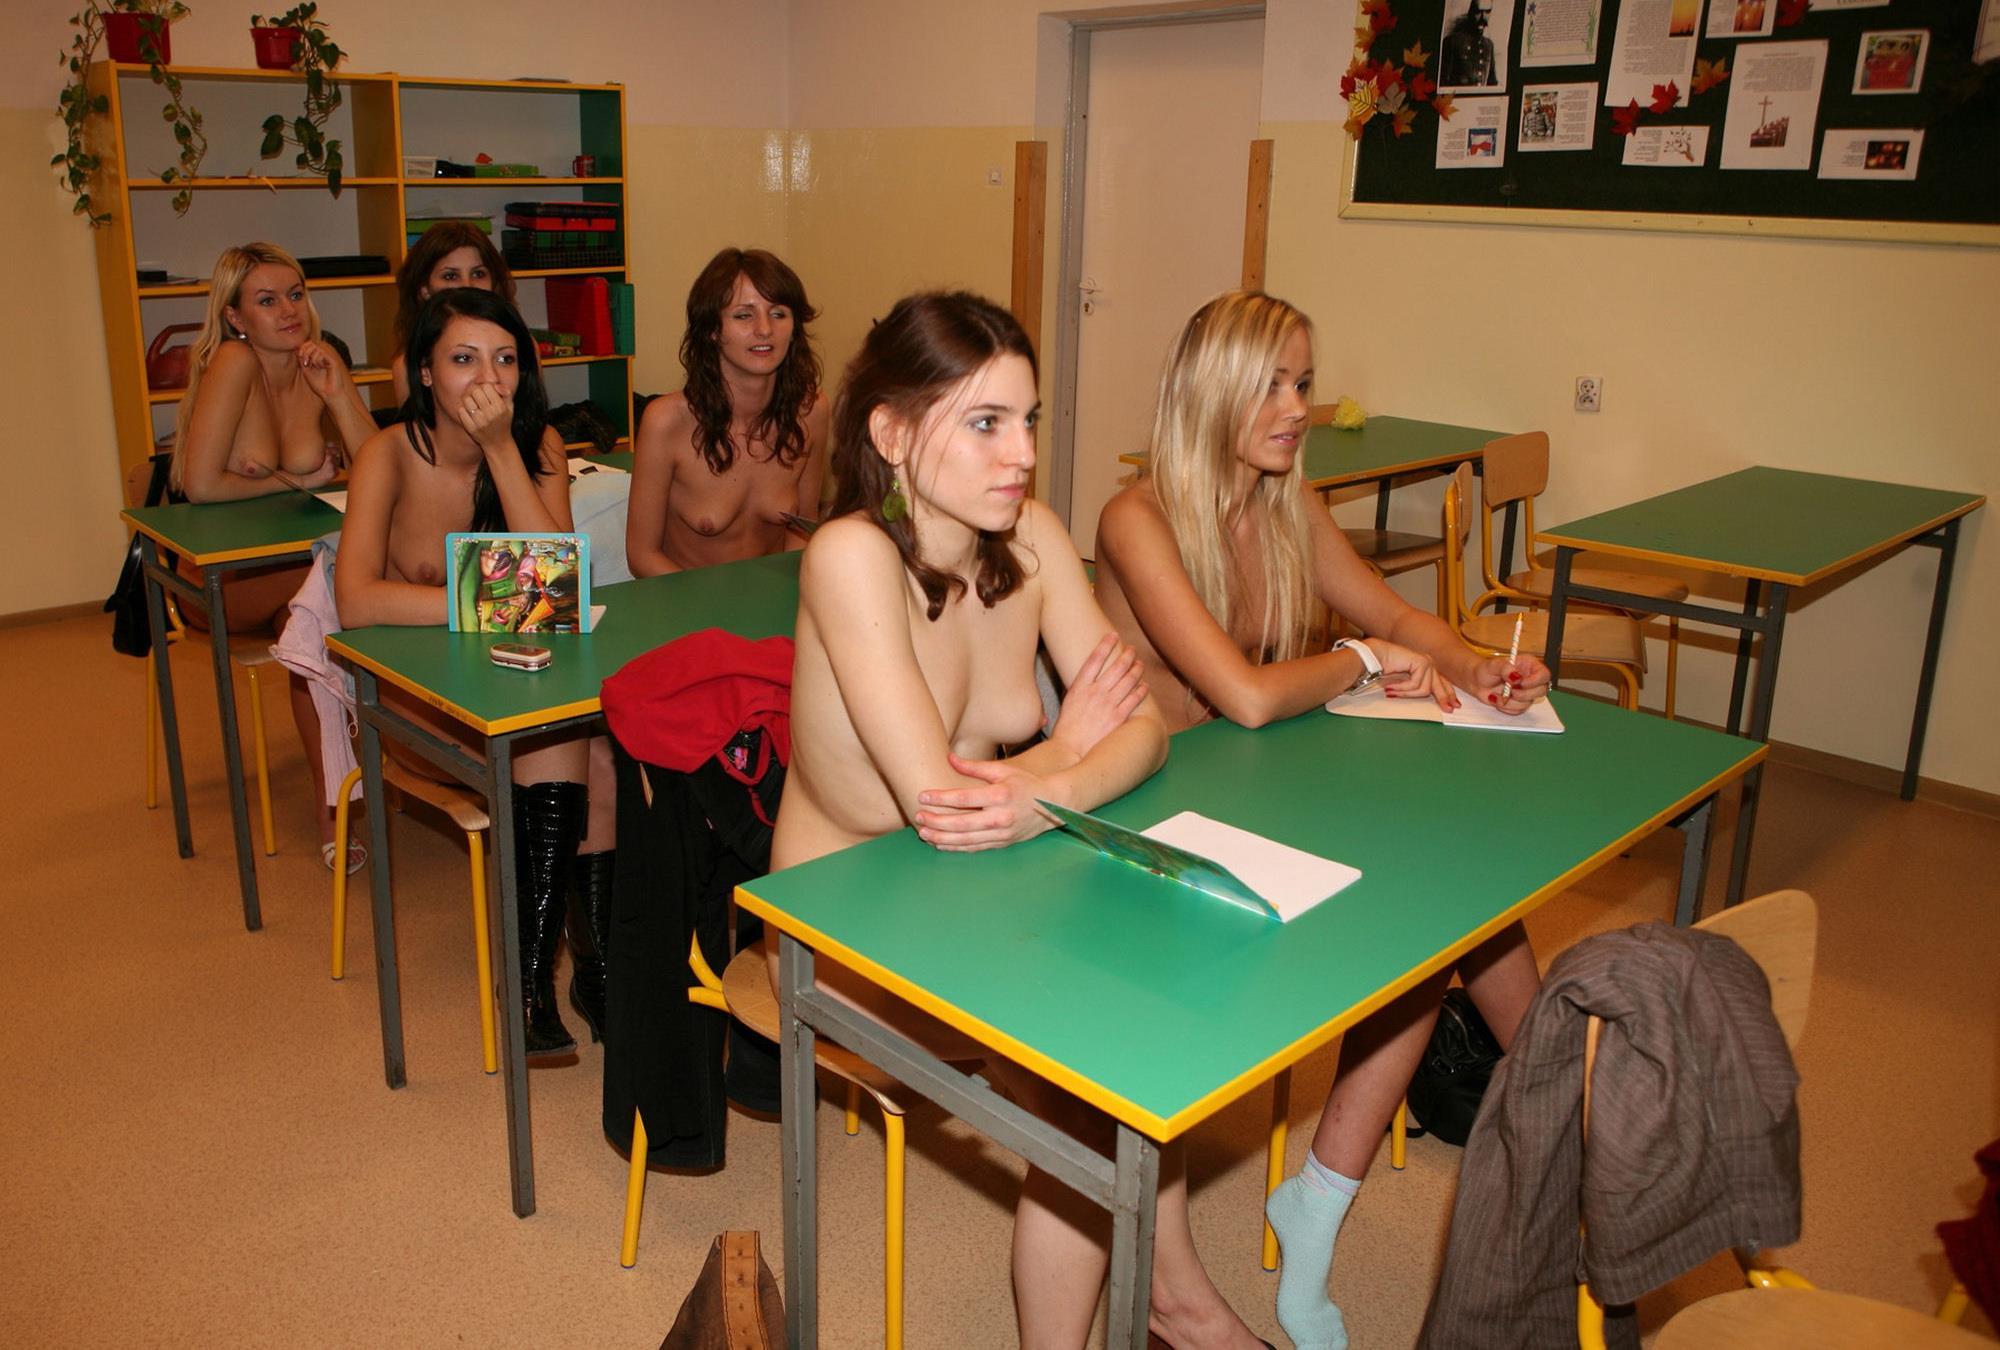 Фото эротика девушек в школе на уроках фото 609-623